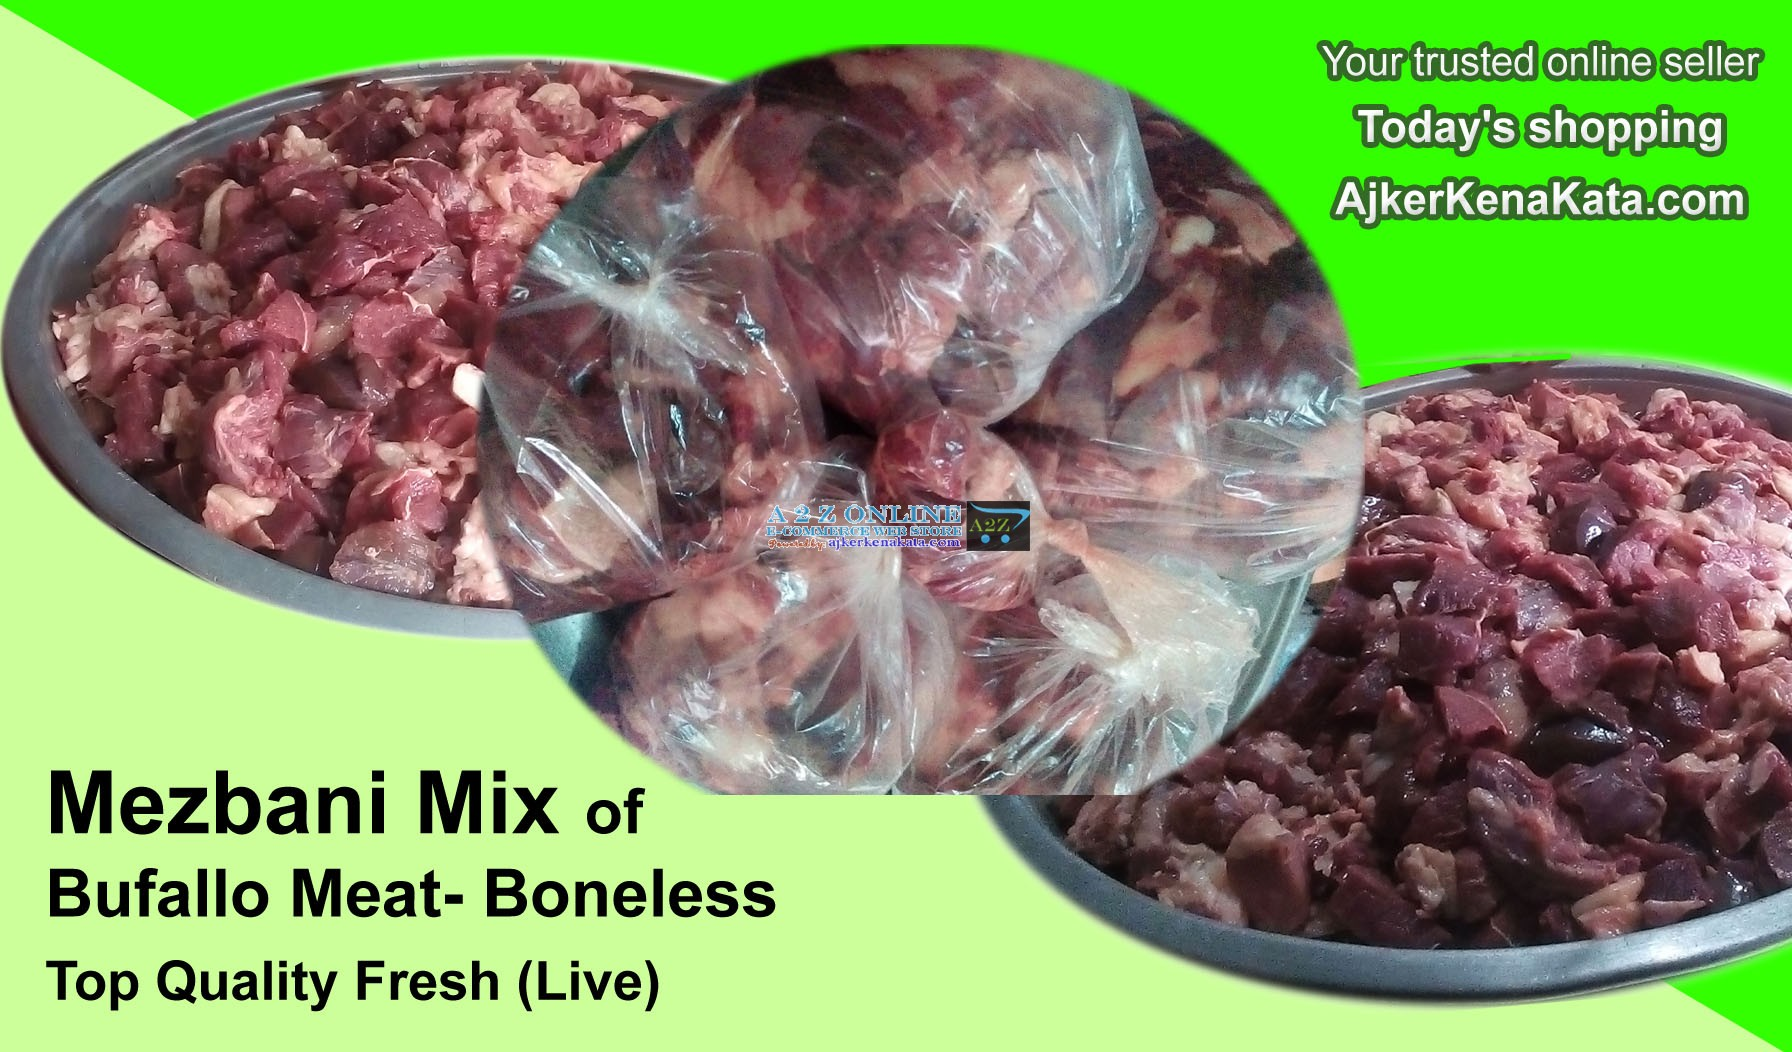 Cow Meat- গরুর গোশত